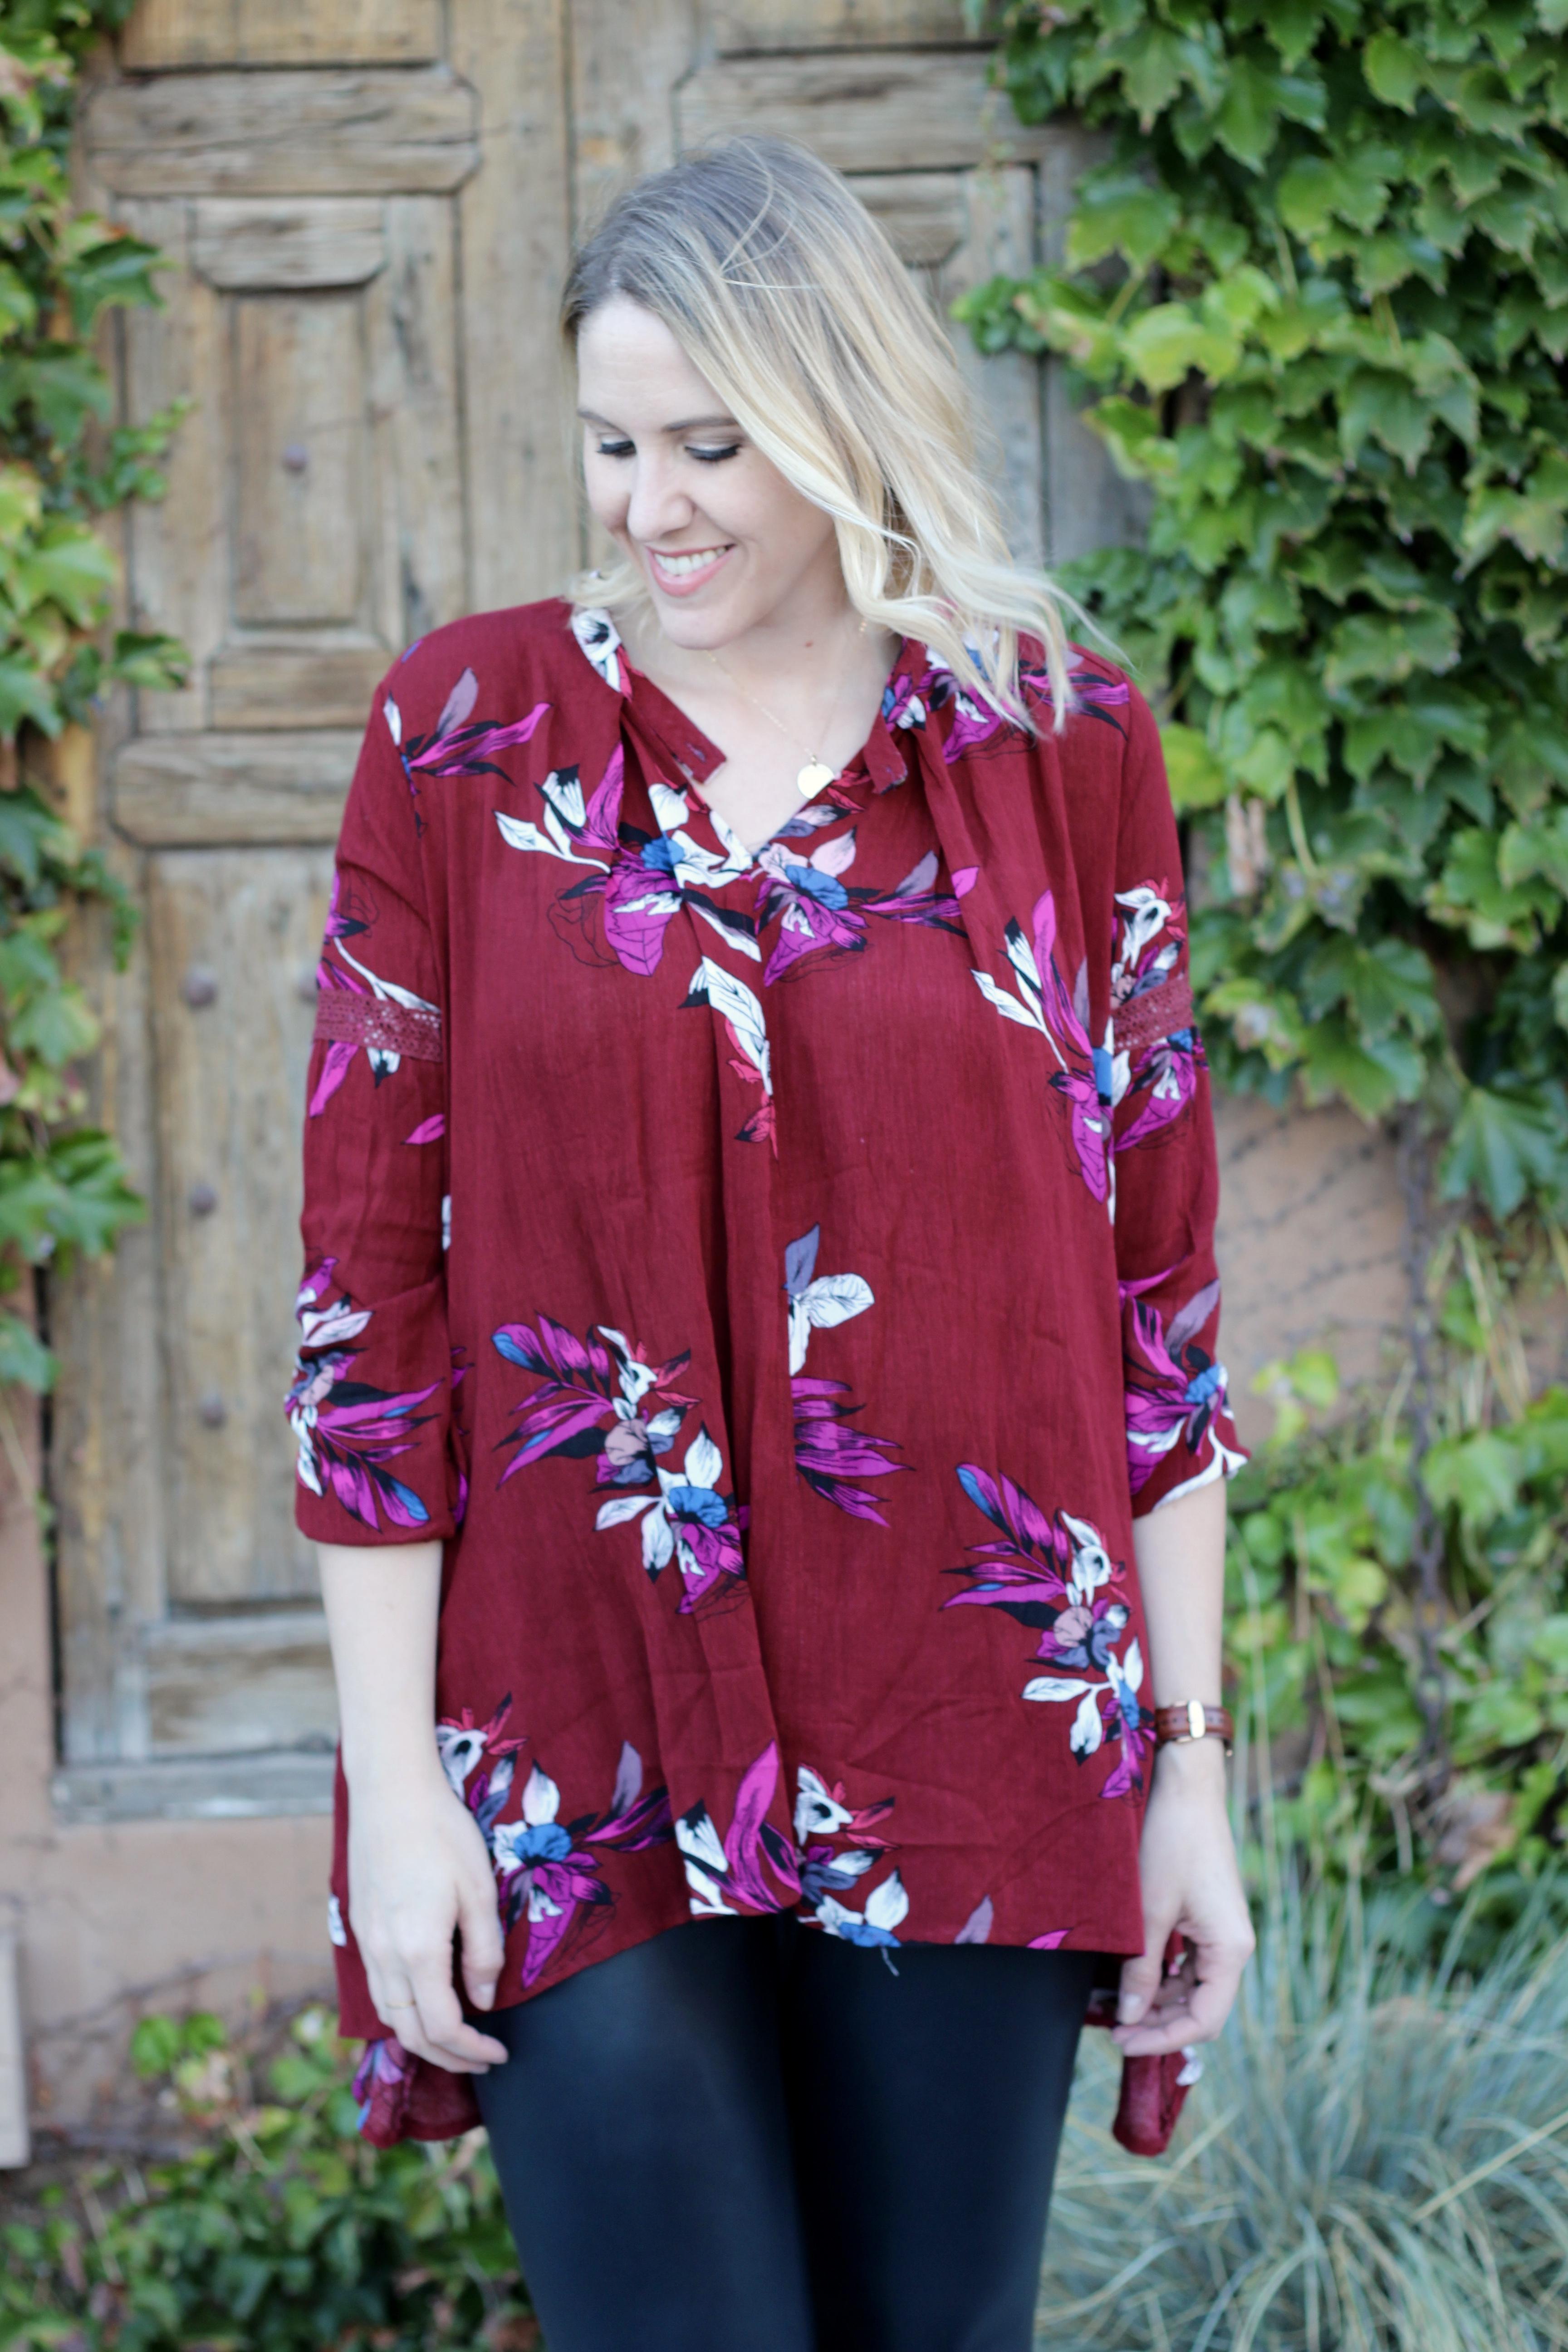 zaful floral print tunic for fall #floralprinttunic #fallflorals #falloutfit